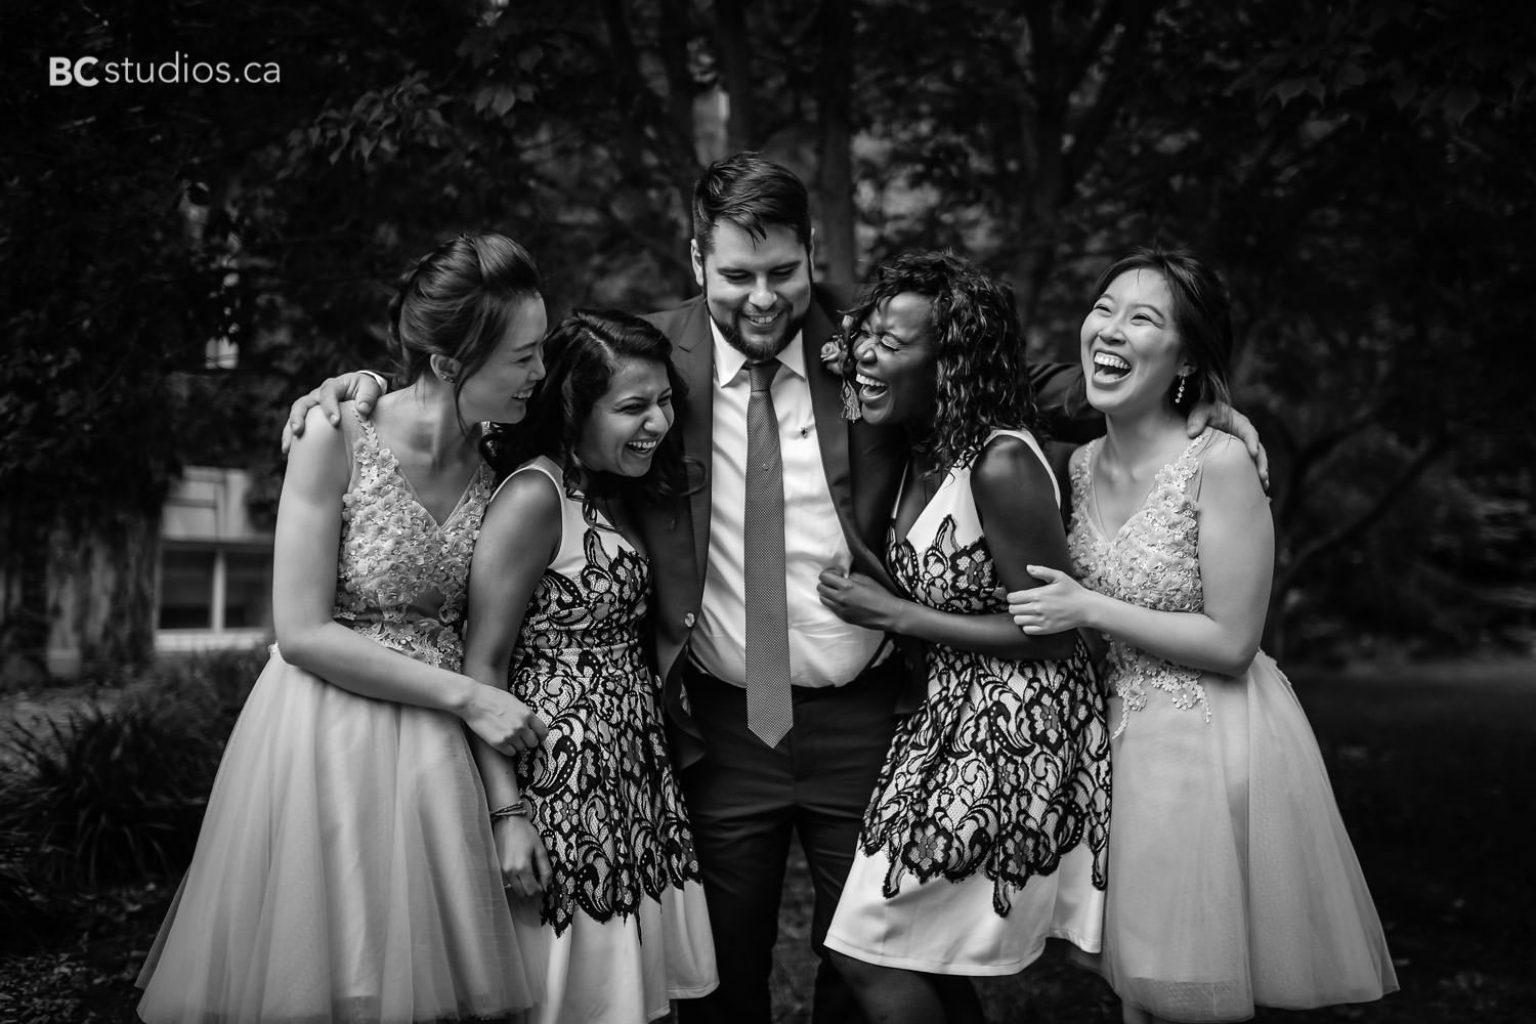 creative formals at university of alberta. groom and bridesamids and groomsmaids.